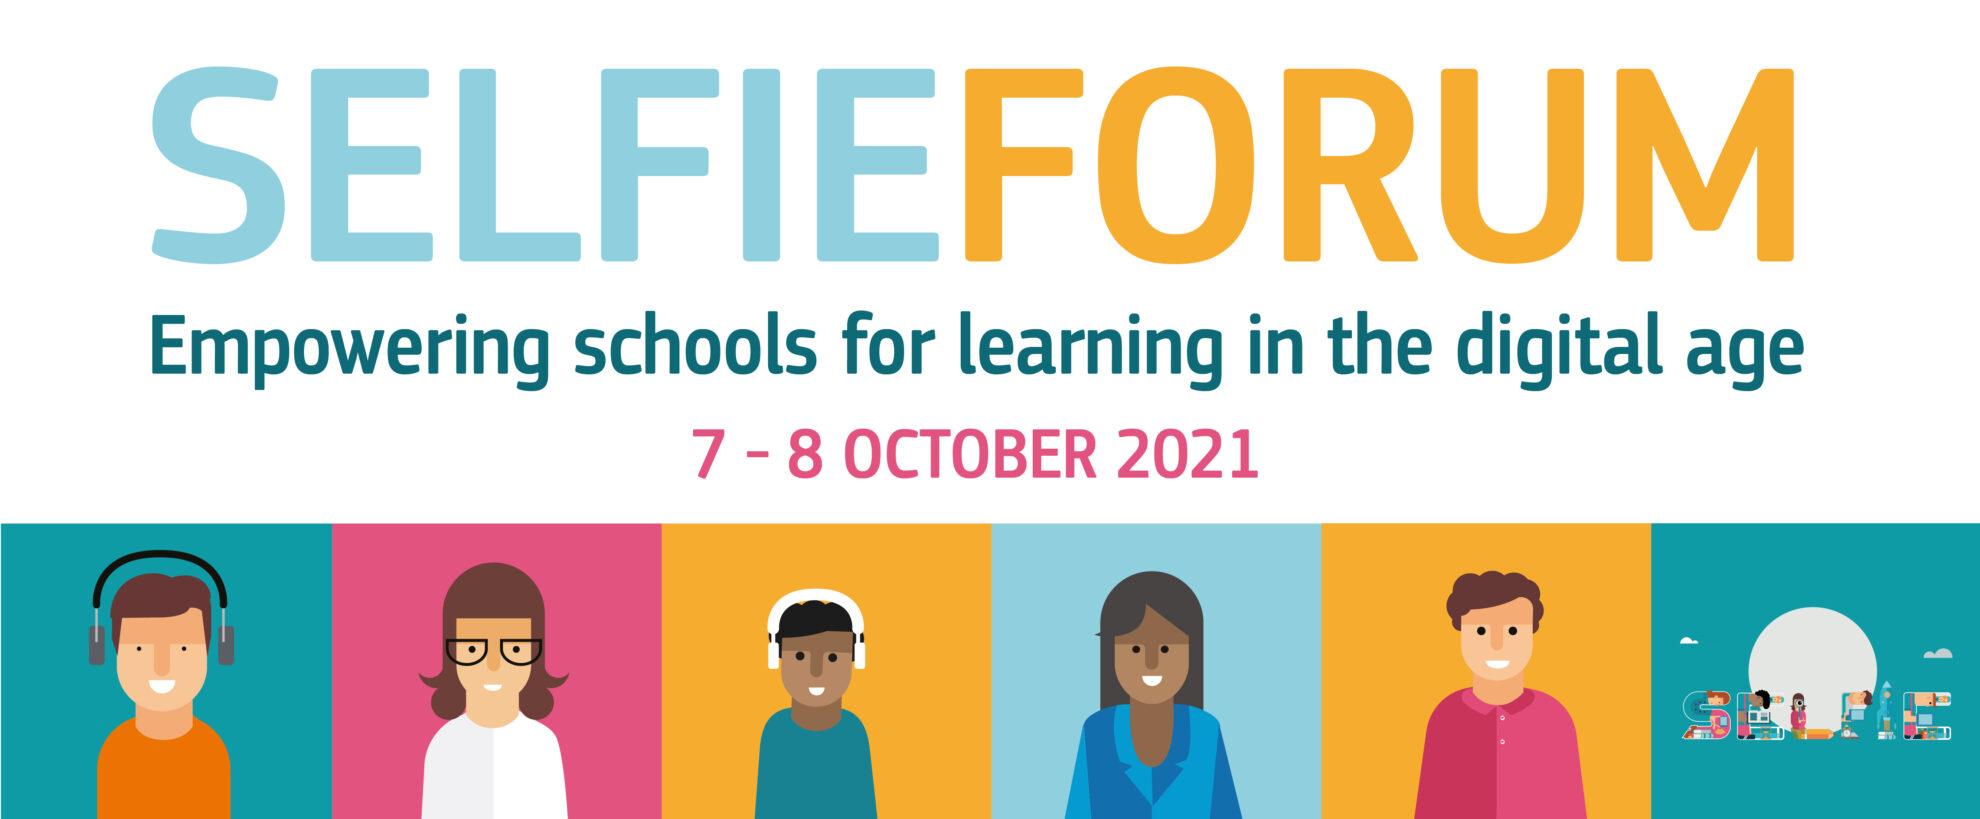 Drugi SELFIE forum održat će se online 7. i 8. listopada.